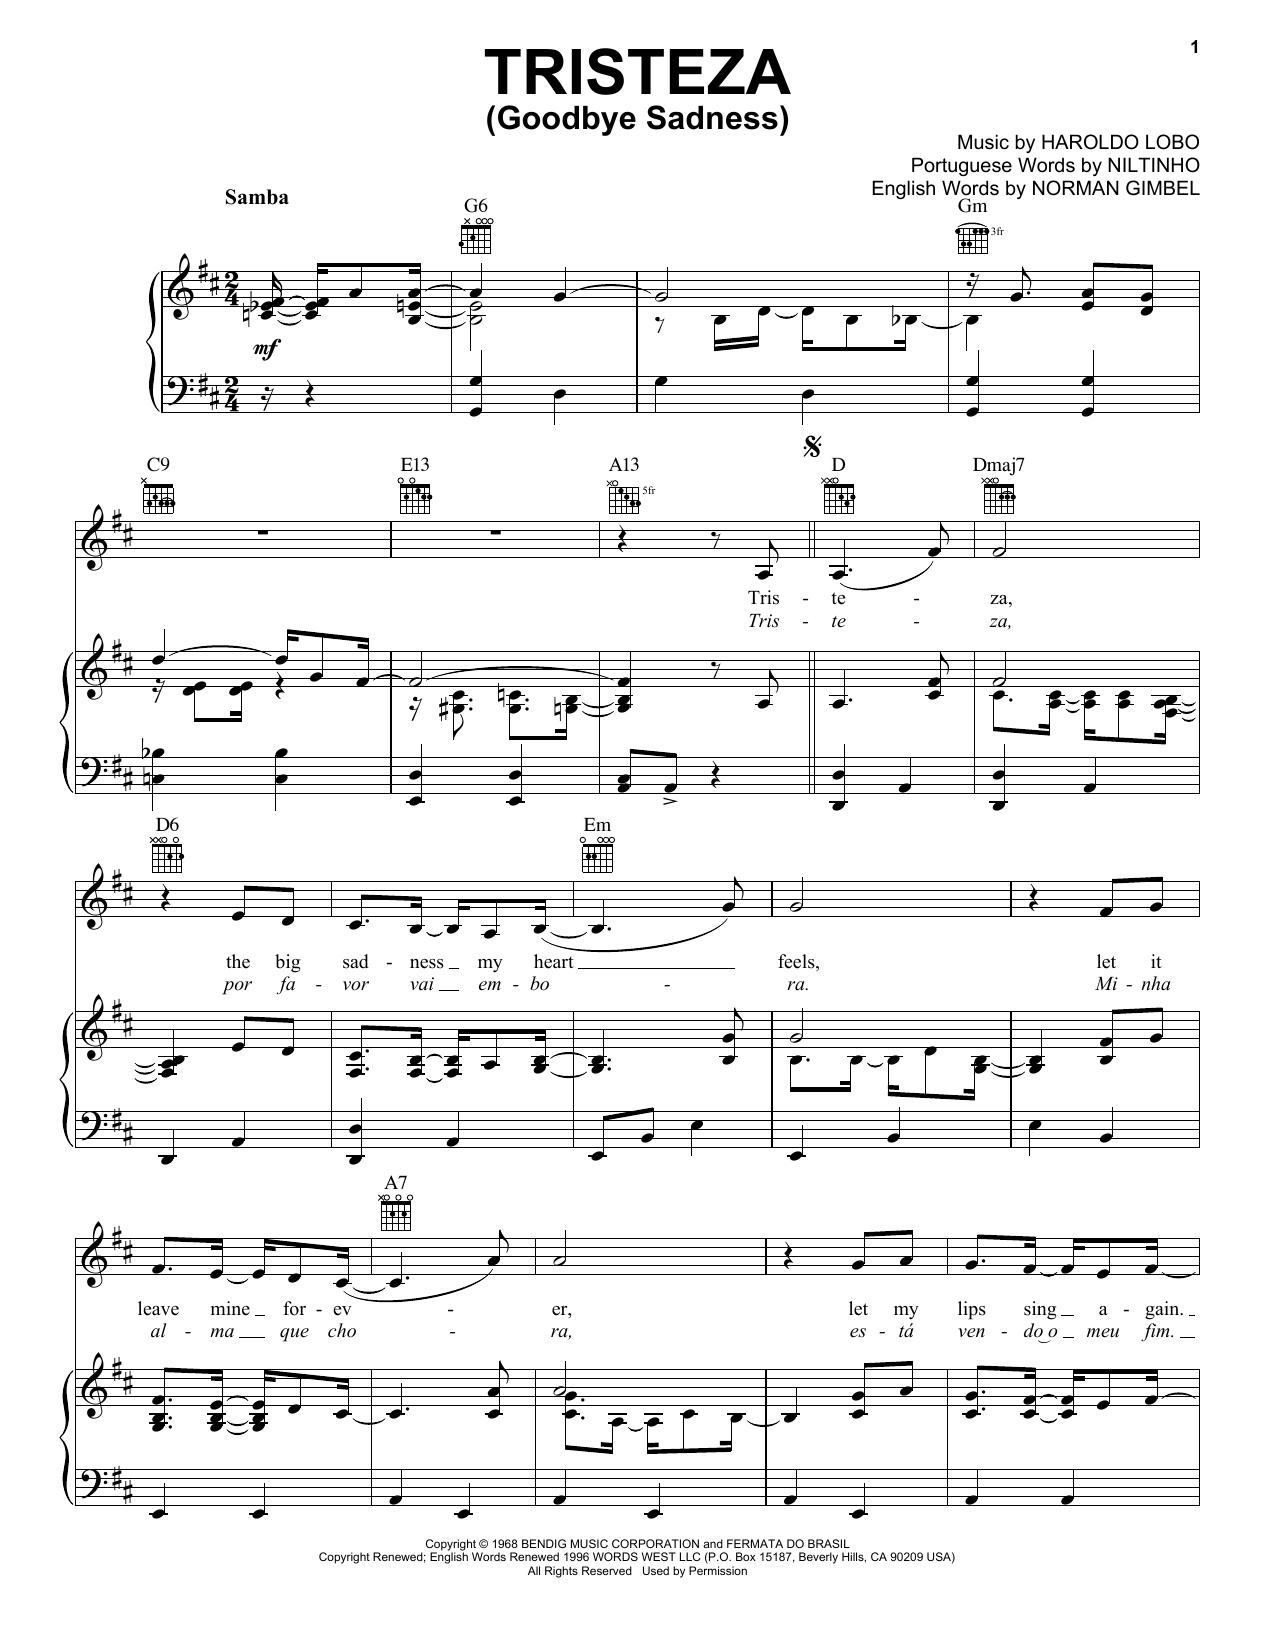 Niltinho Tristeza (Goodbye Sadness) sheet music notes and chords. Download Printable PDF.